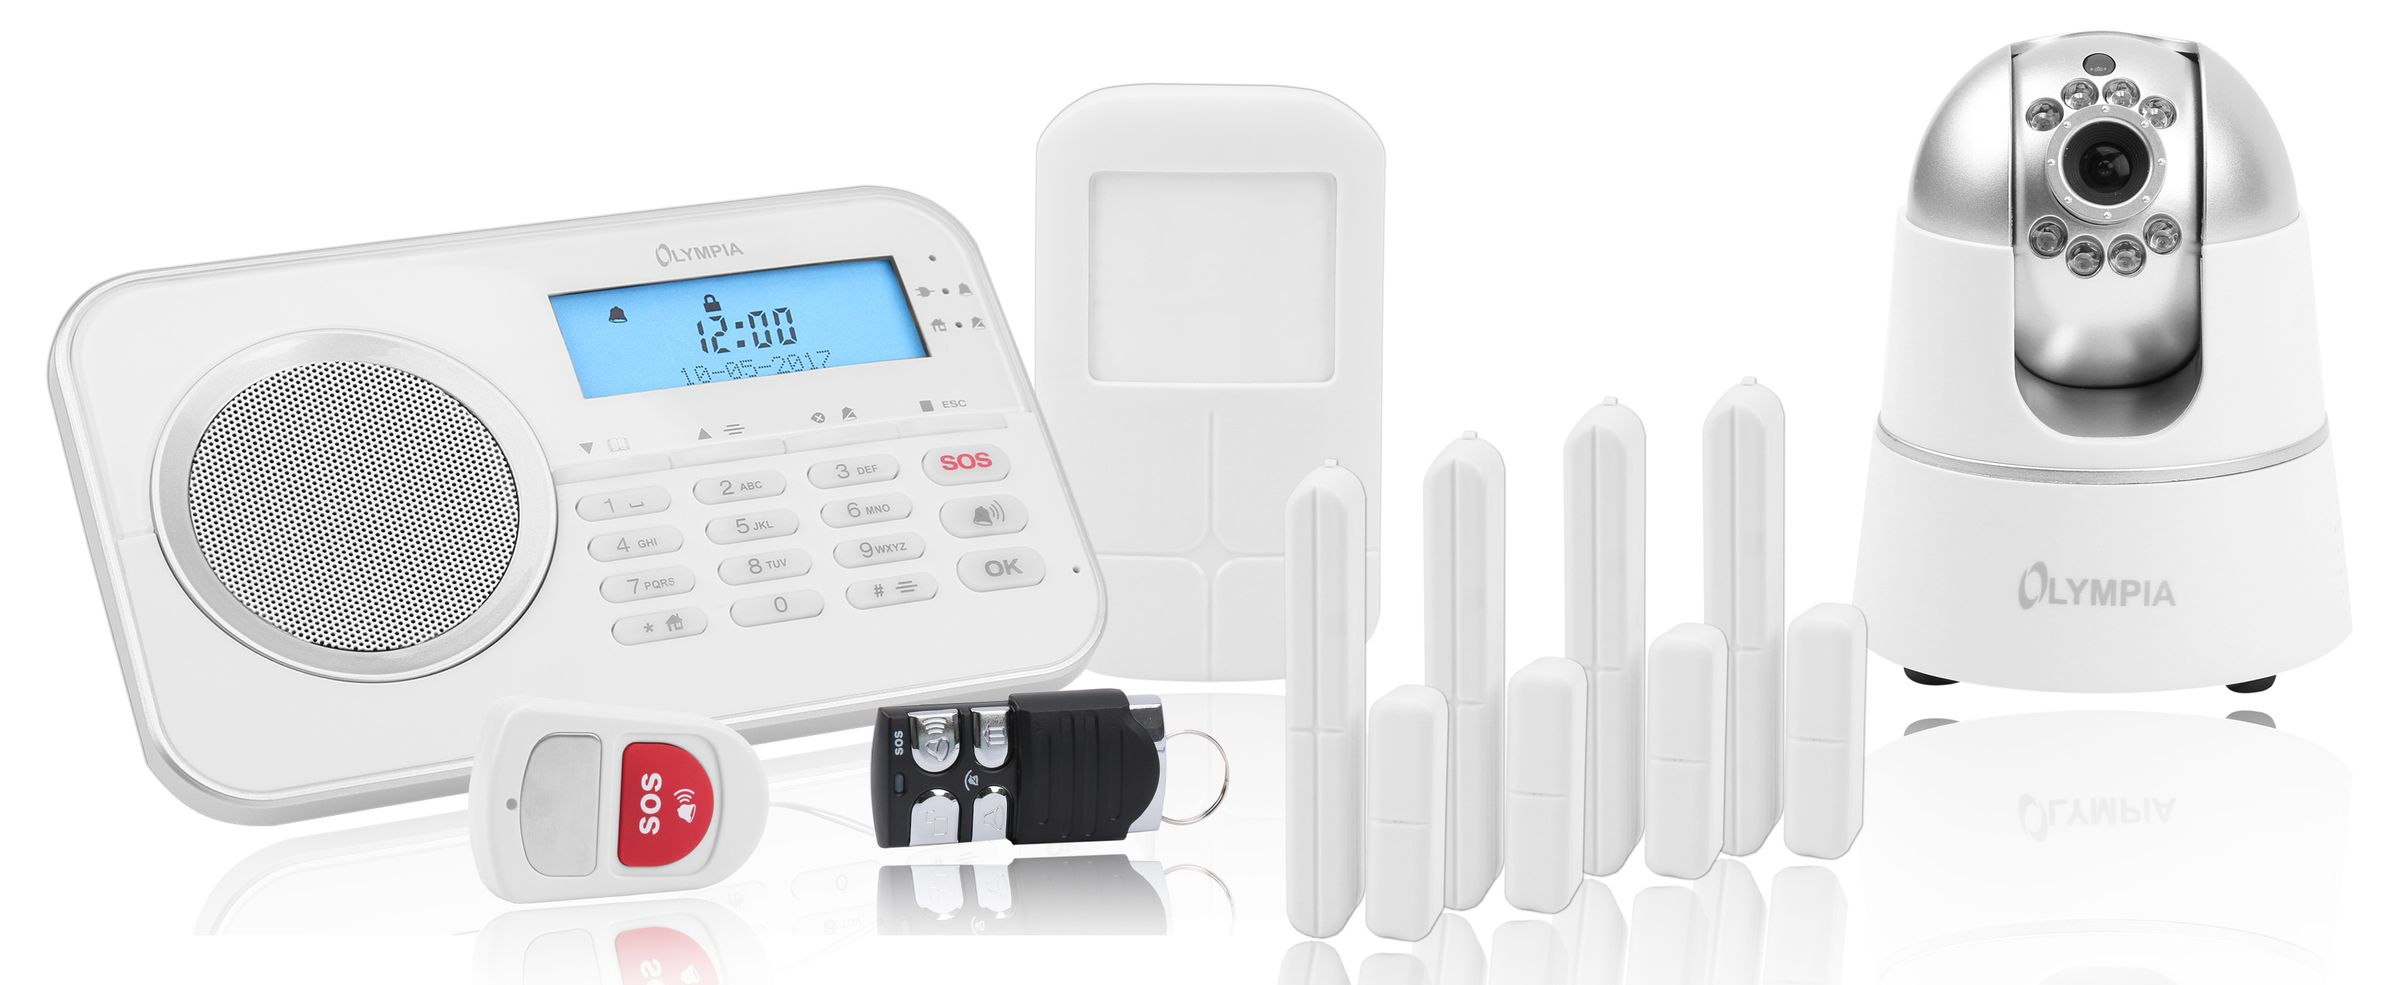 Full Size of Protron W20 Smart Home Alarmanlage Proton App Bedienungsanleitung Haus Mit Kamera Olympia Protect 9881 Gsm Wohnzimmer Protron W20